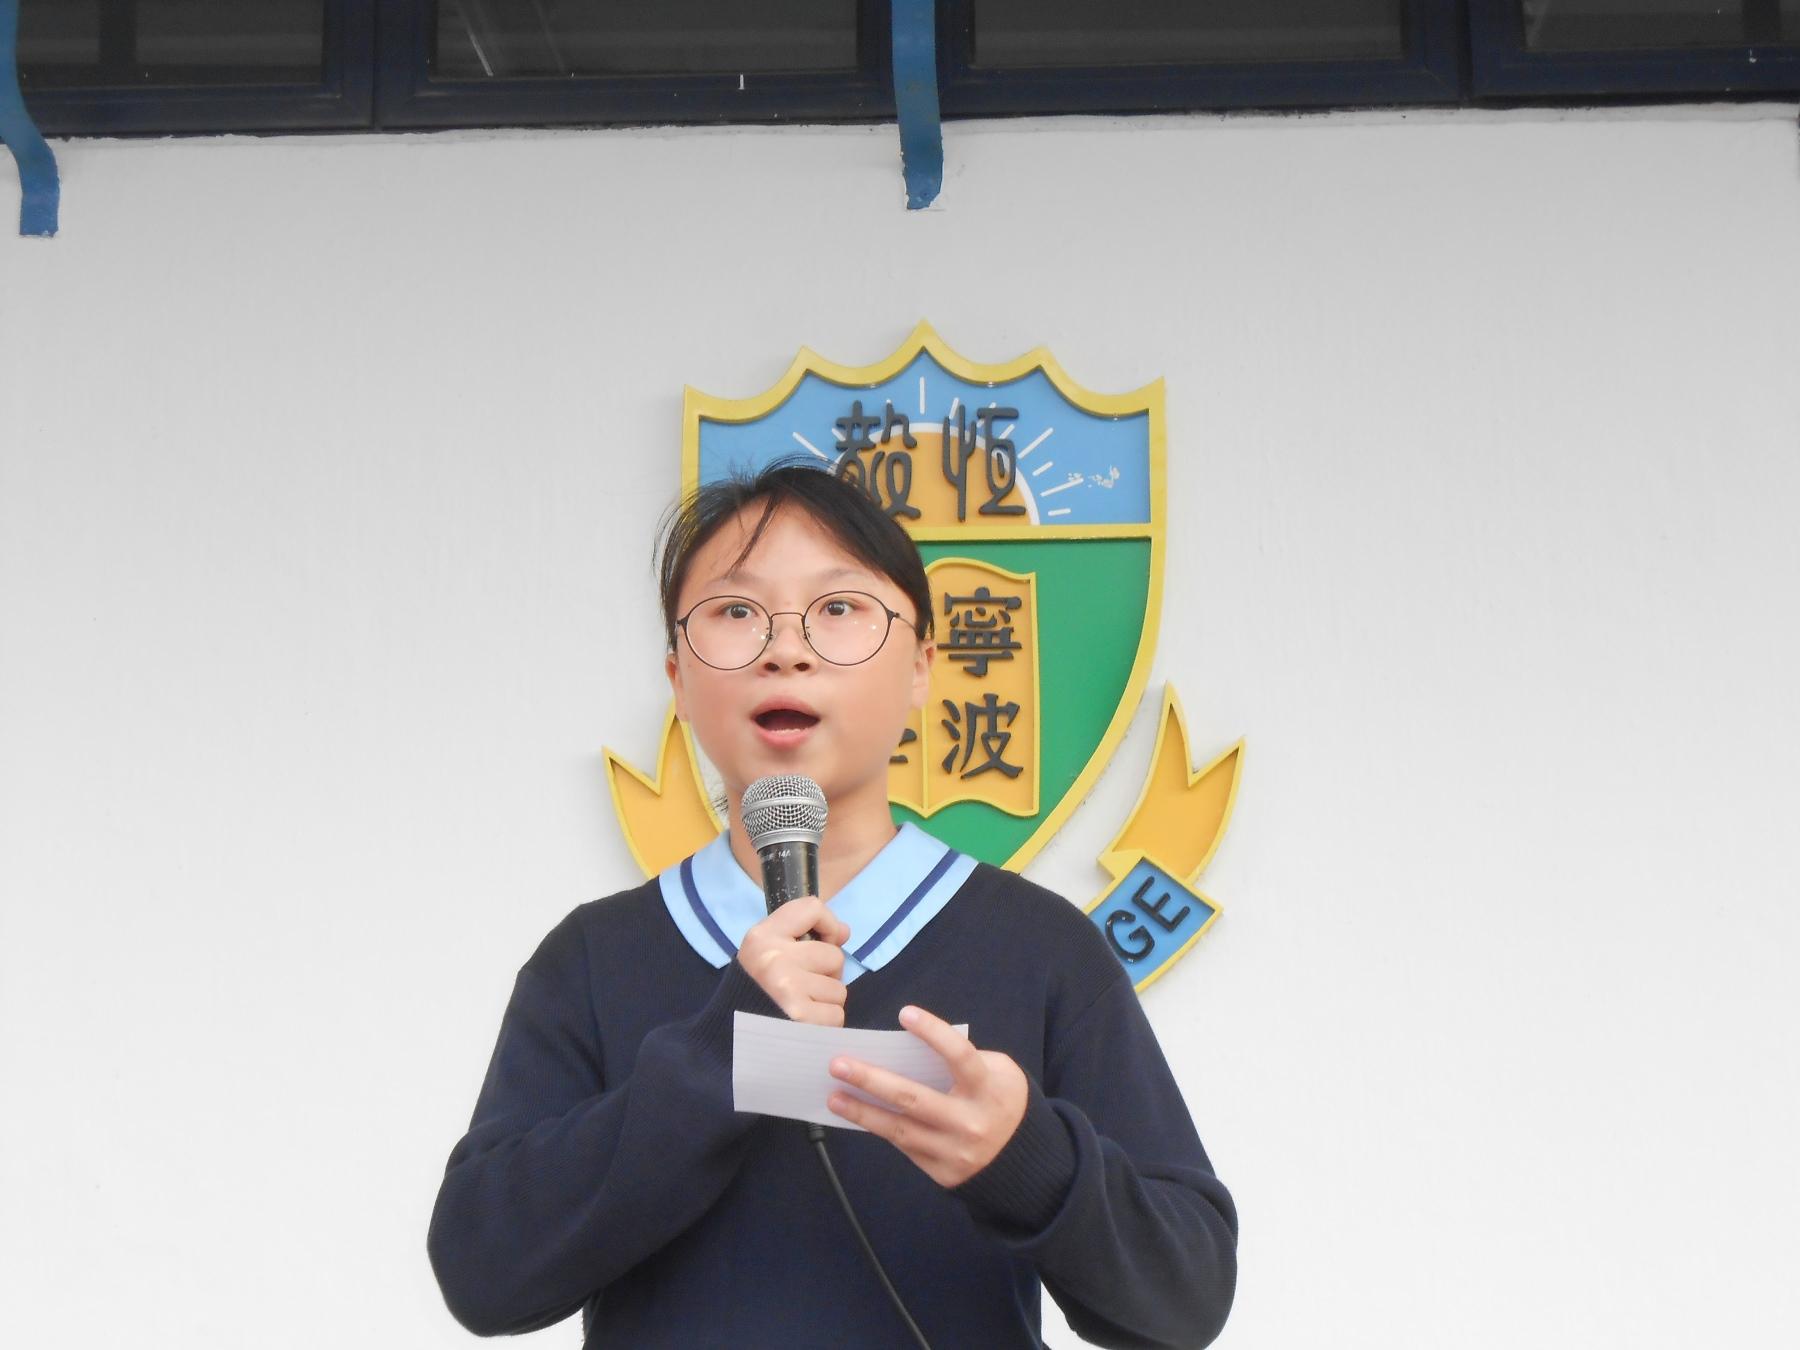 https://www.npc.edu.hk/sites/default/files/dscn0016.jpg